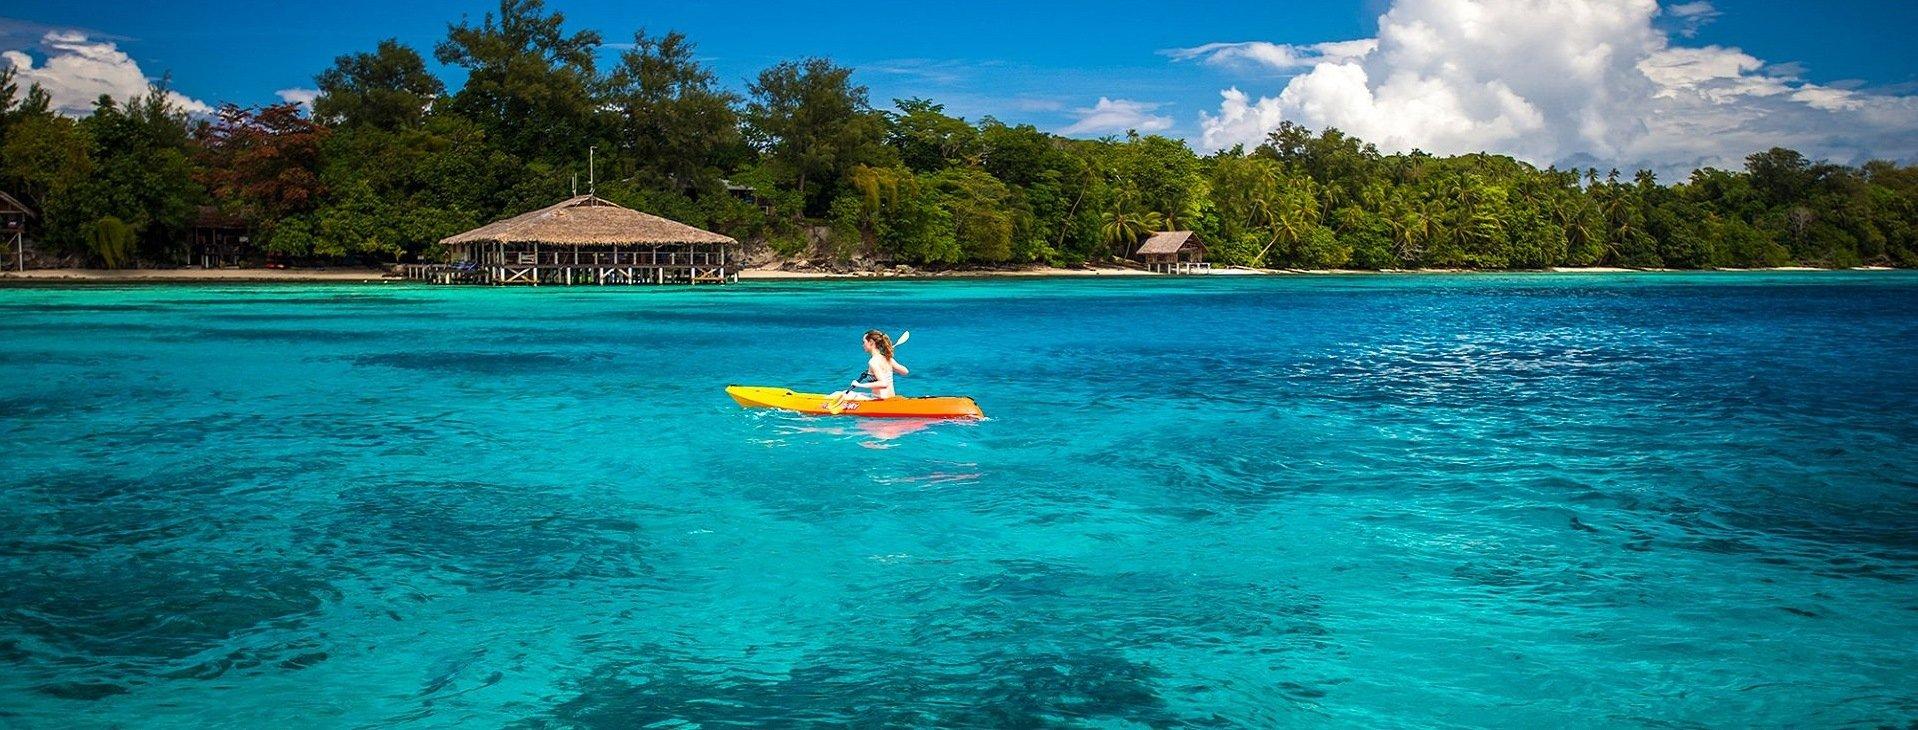 Solomon Islands Fatboys Resort travel destinations (1)